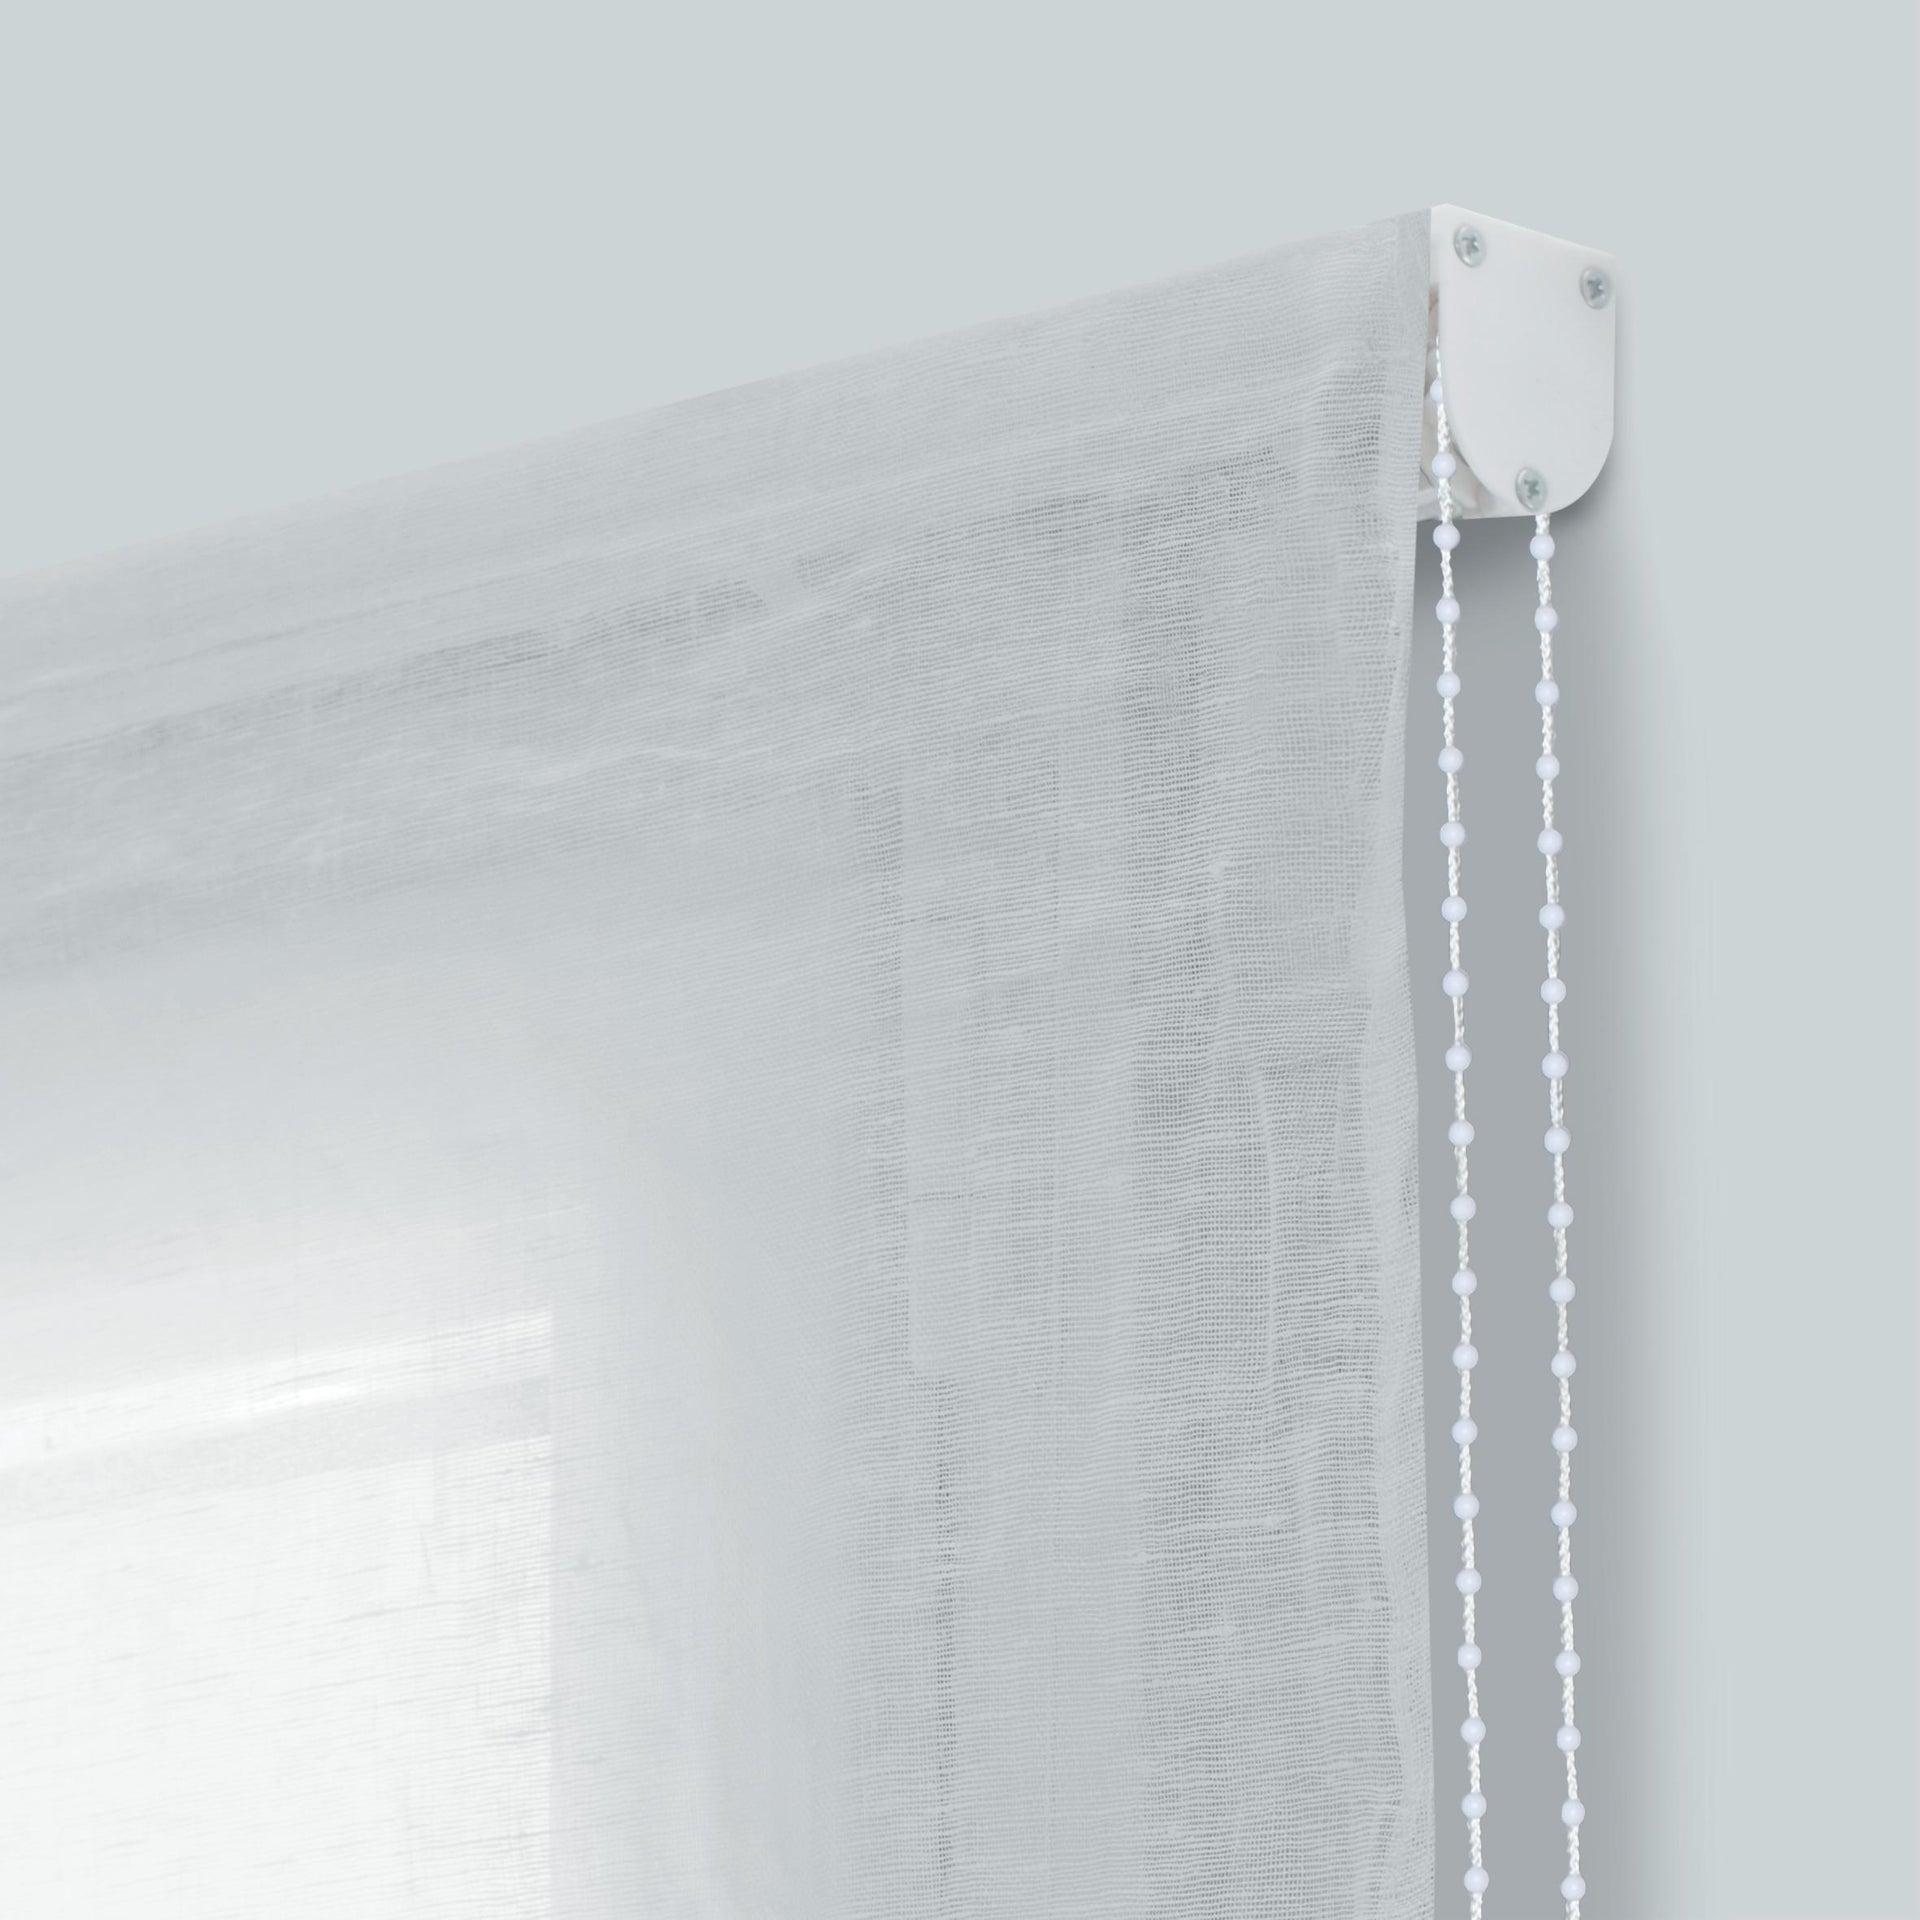 Tenda a pacchetto INSPIRE Elfi bianco 120x250 cm - 2